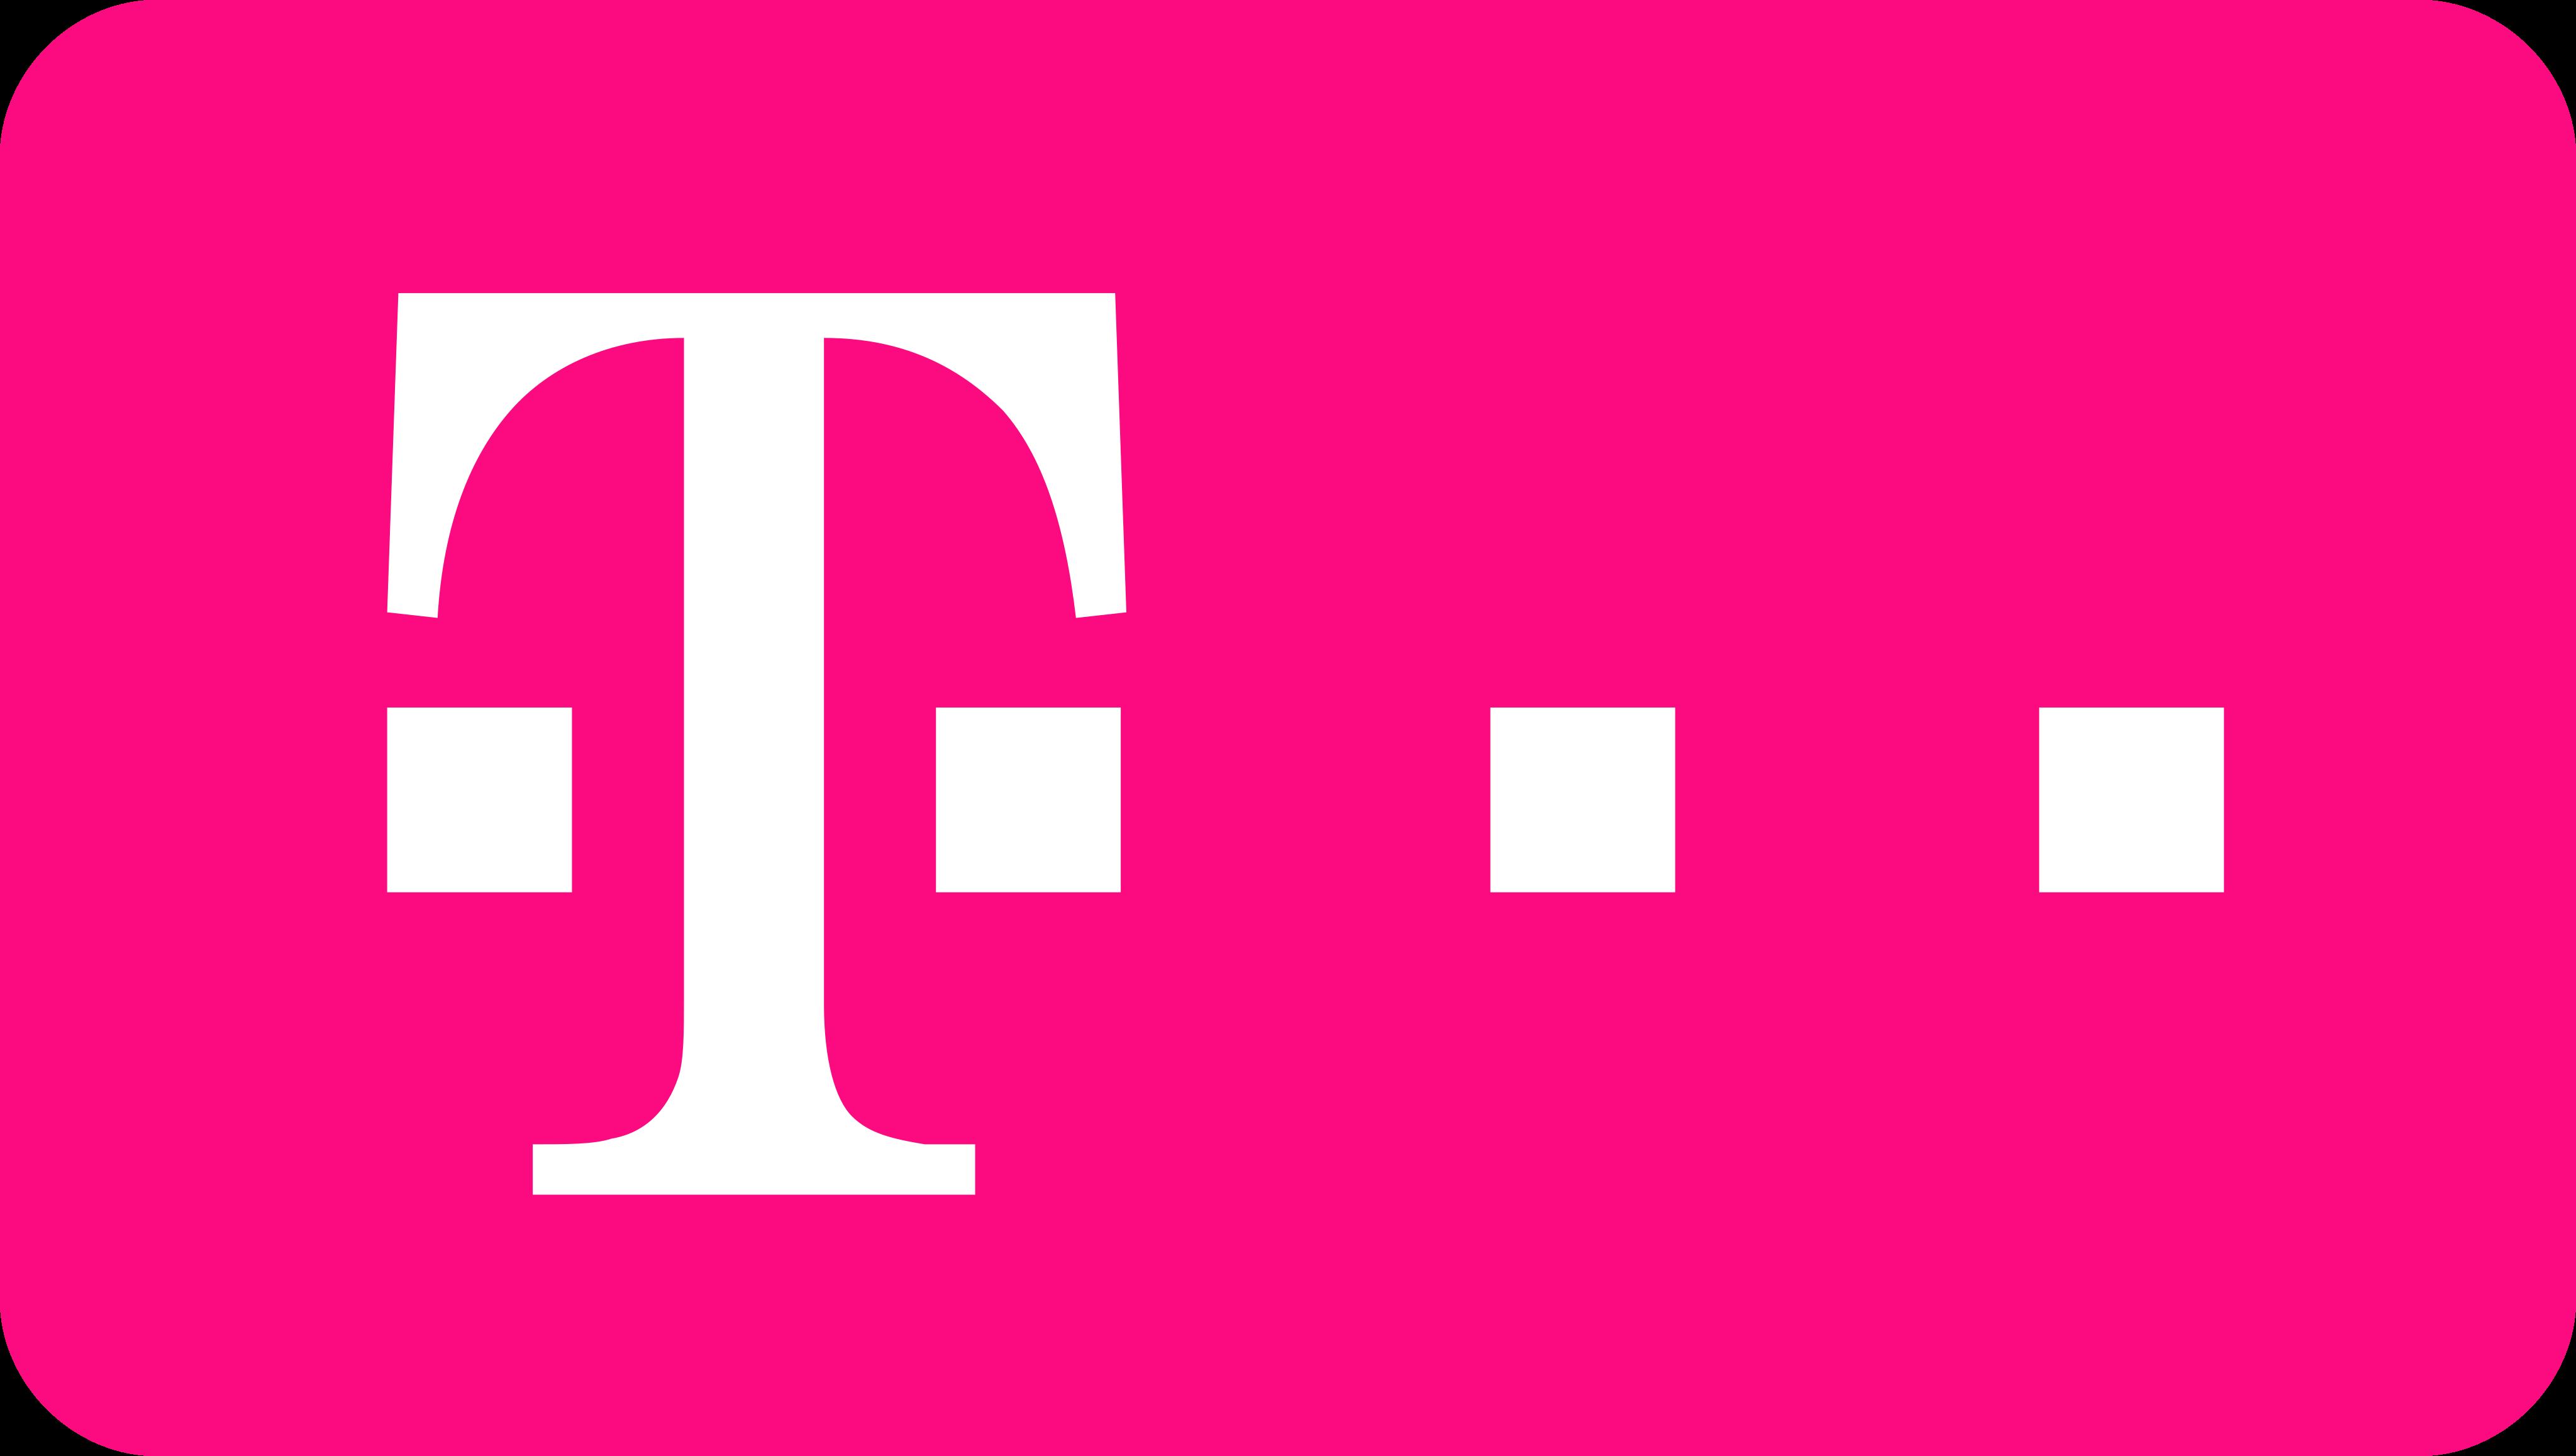 deutsche telekom logo 2 - Deutsche Telekom Logo